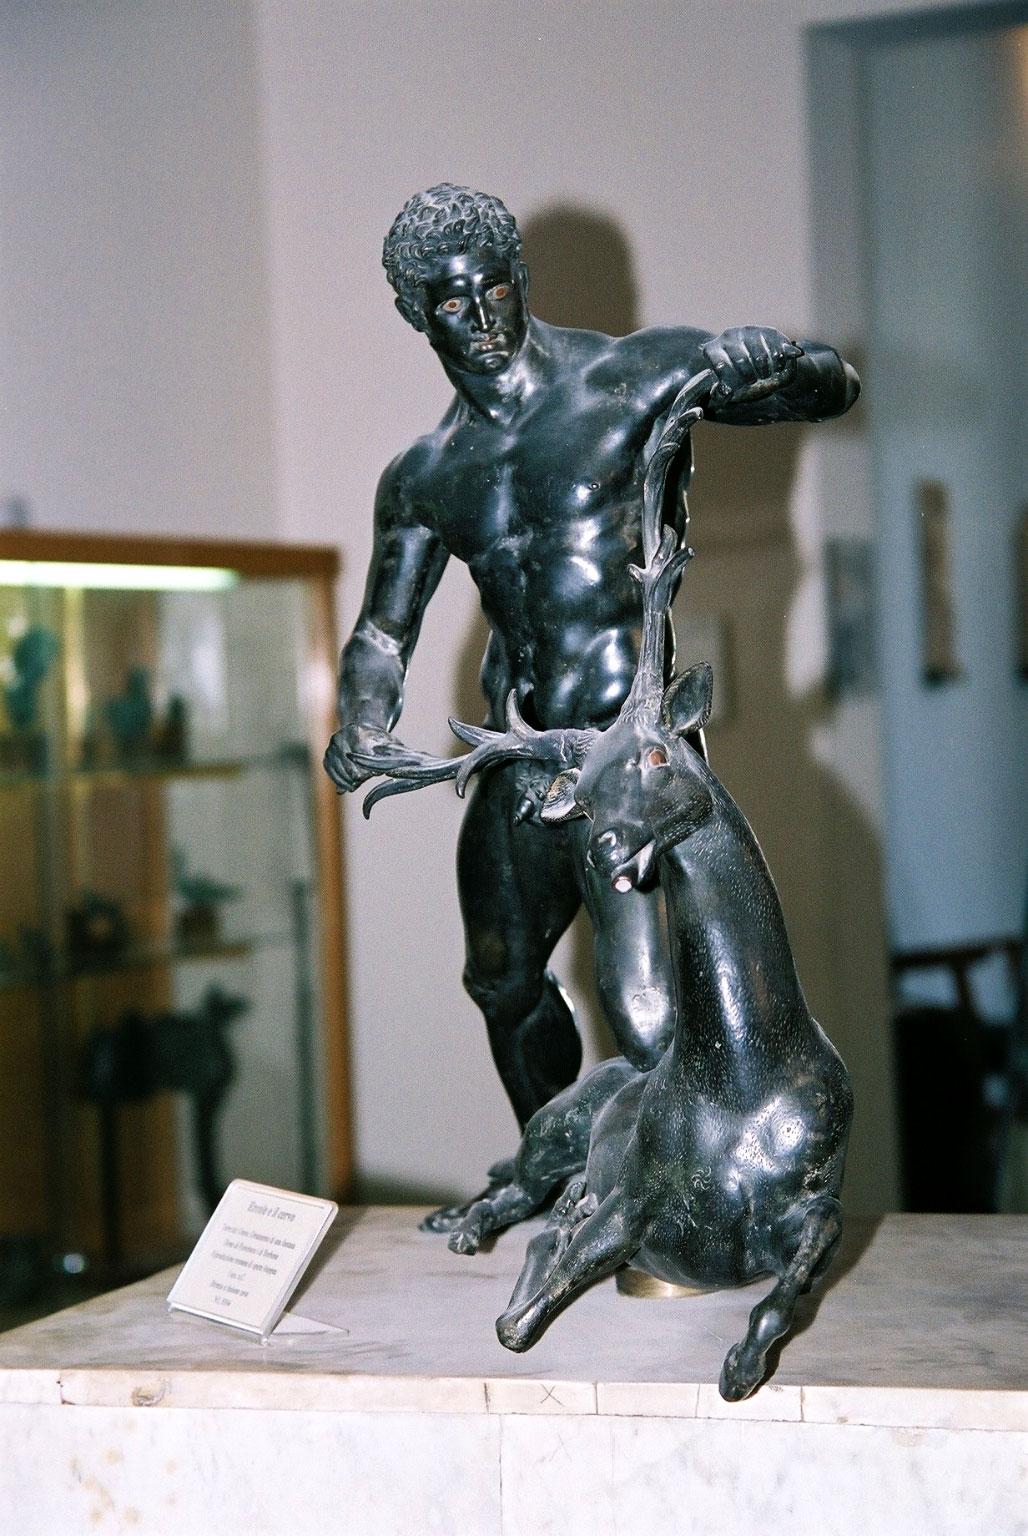 File:Palermo-Museo-Archeologico-bjs-08.jpg - Wikimedia Commons